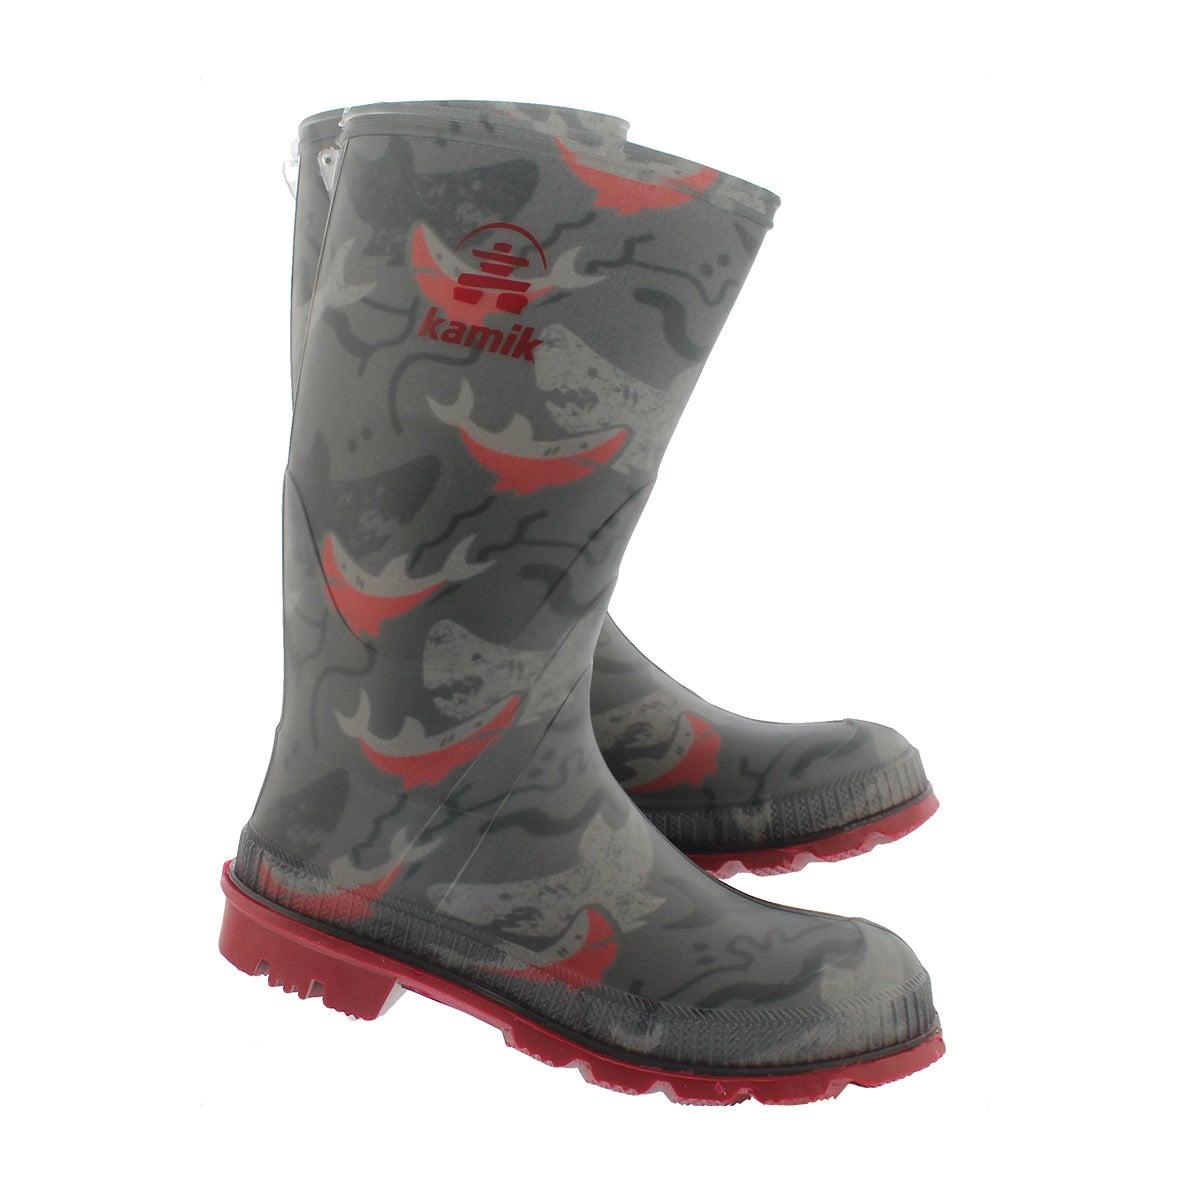 Bys Stomp2 char/red prnt wtpf rain boot